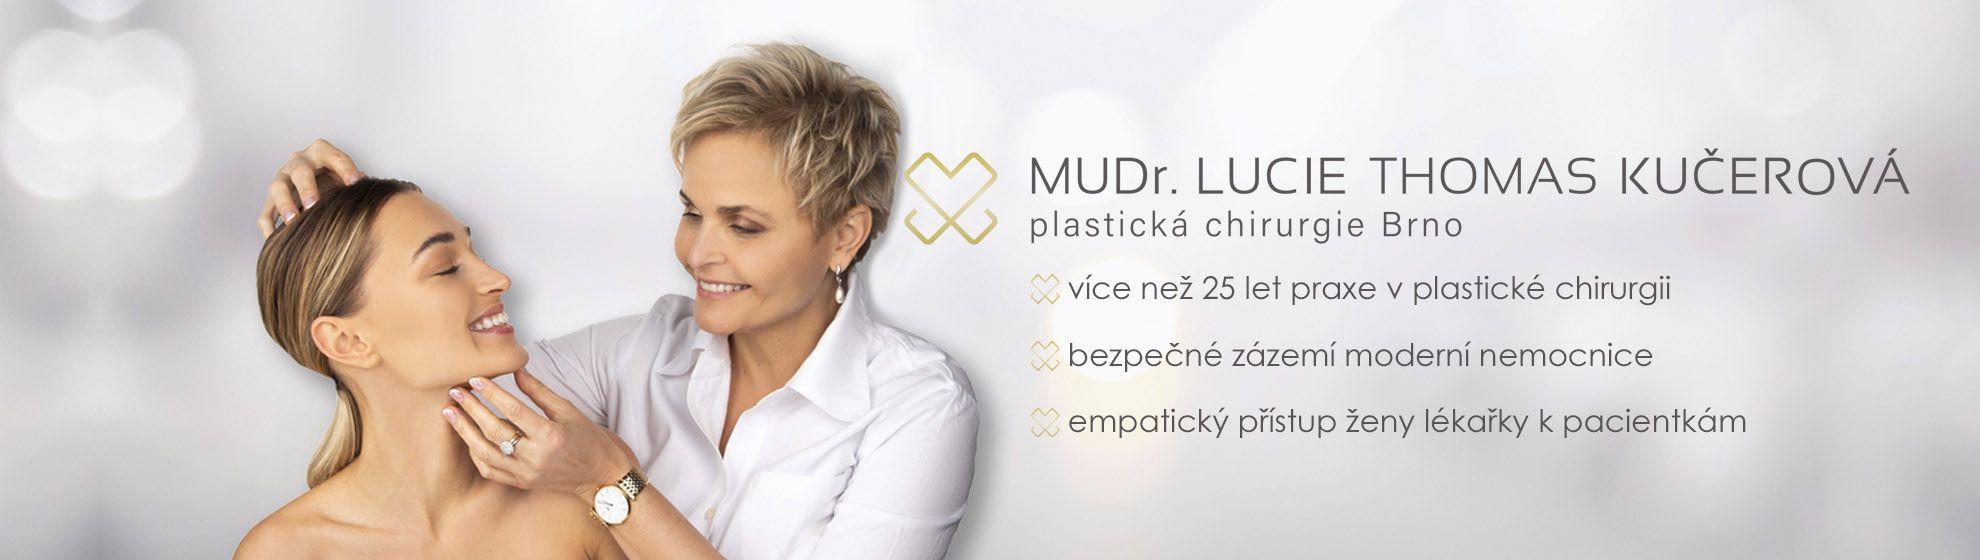 MUDr. Lucie Kučerová